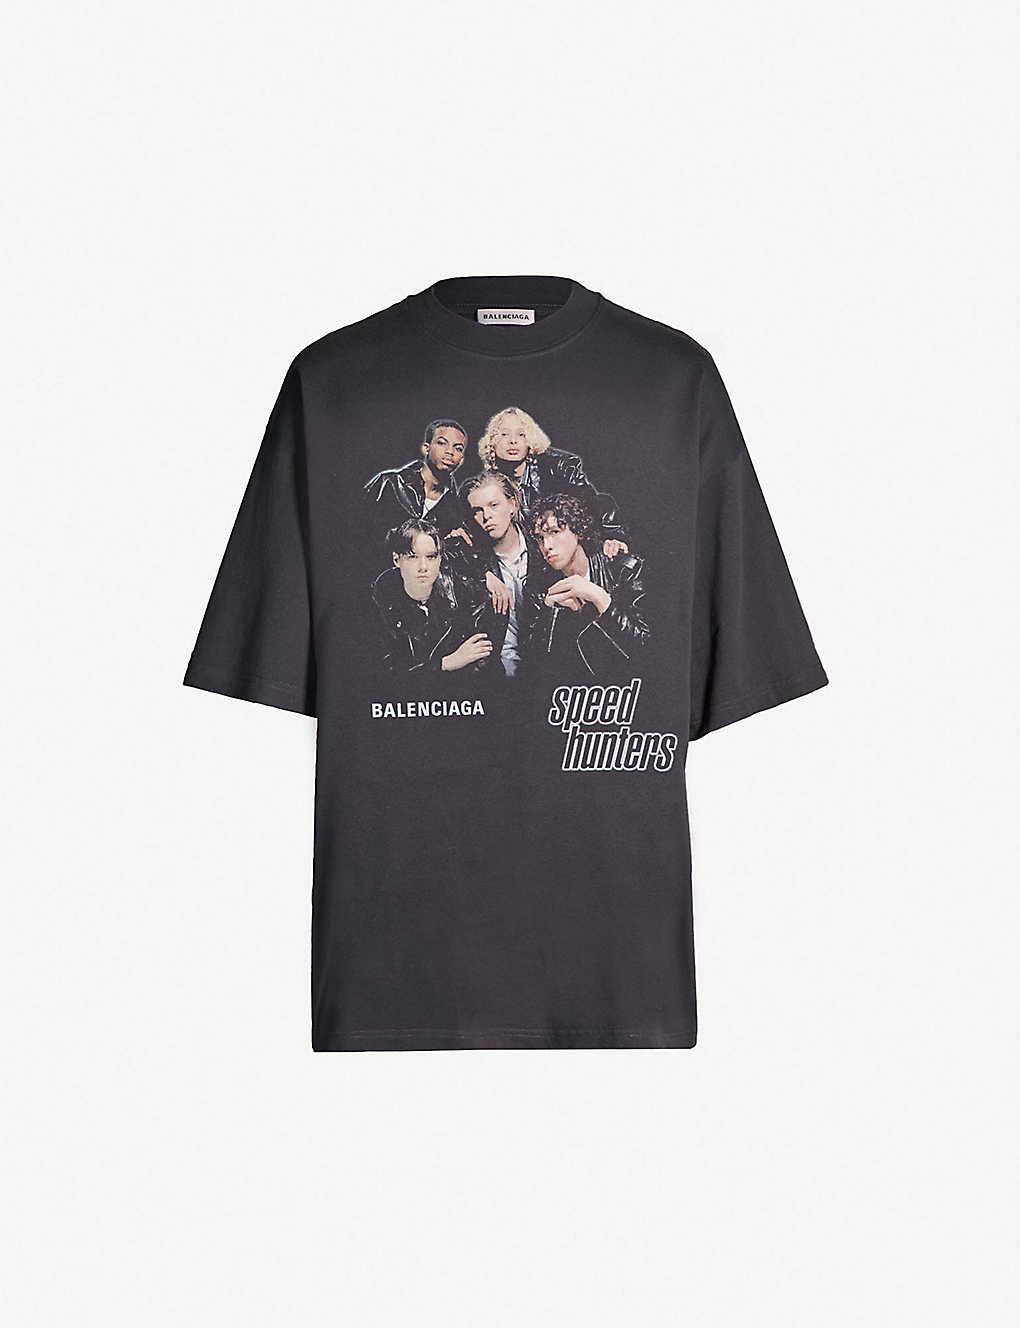 6511cb01902b BALENCIAGA - Speedhunters-print oversized cotton-jersey T-shirt |  Selfridges.com